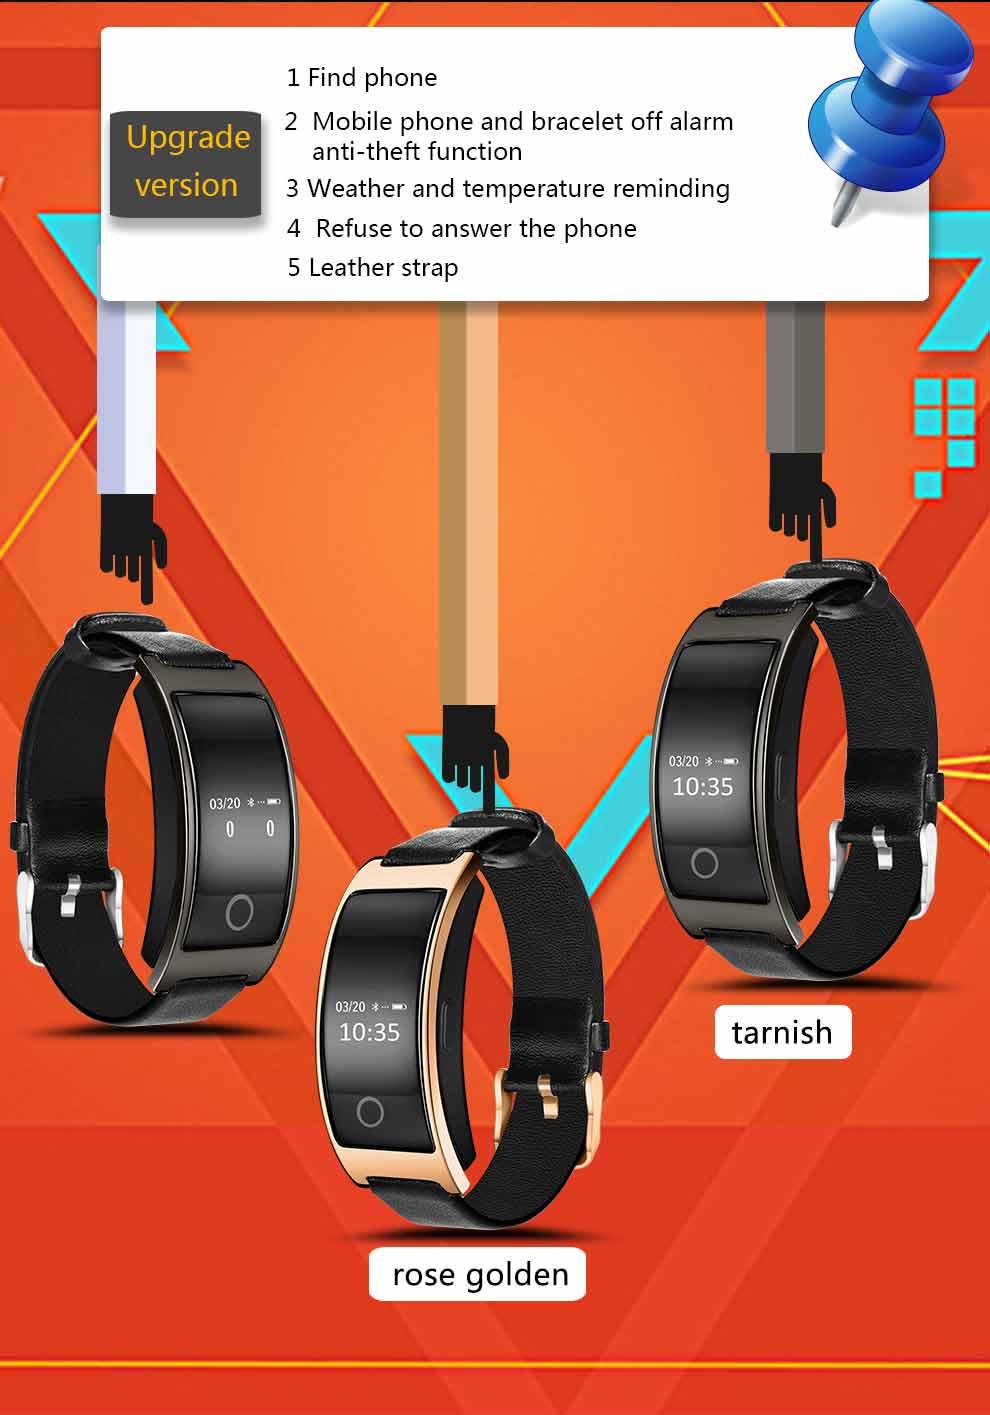 CK11S Smart Band Blood Pressure Heart Rate Monitor Wrist Watch CK11S Smart Band Blood Pressure Heart Rate Monitor Wrist Watch HTB1HpJoQVXXXXXoXXXXq6xXFXXX1